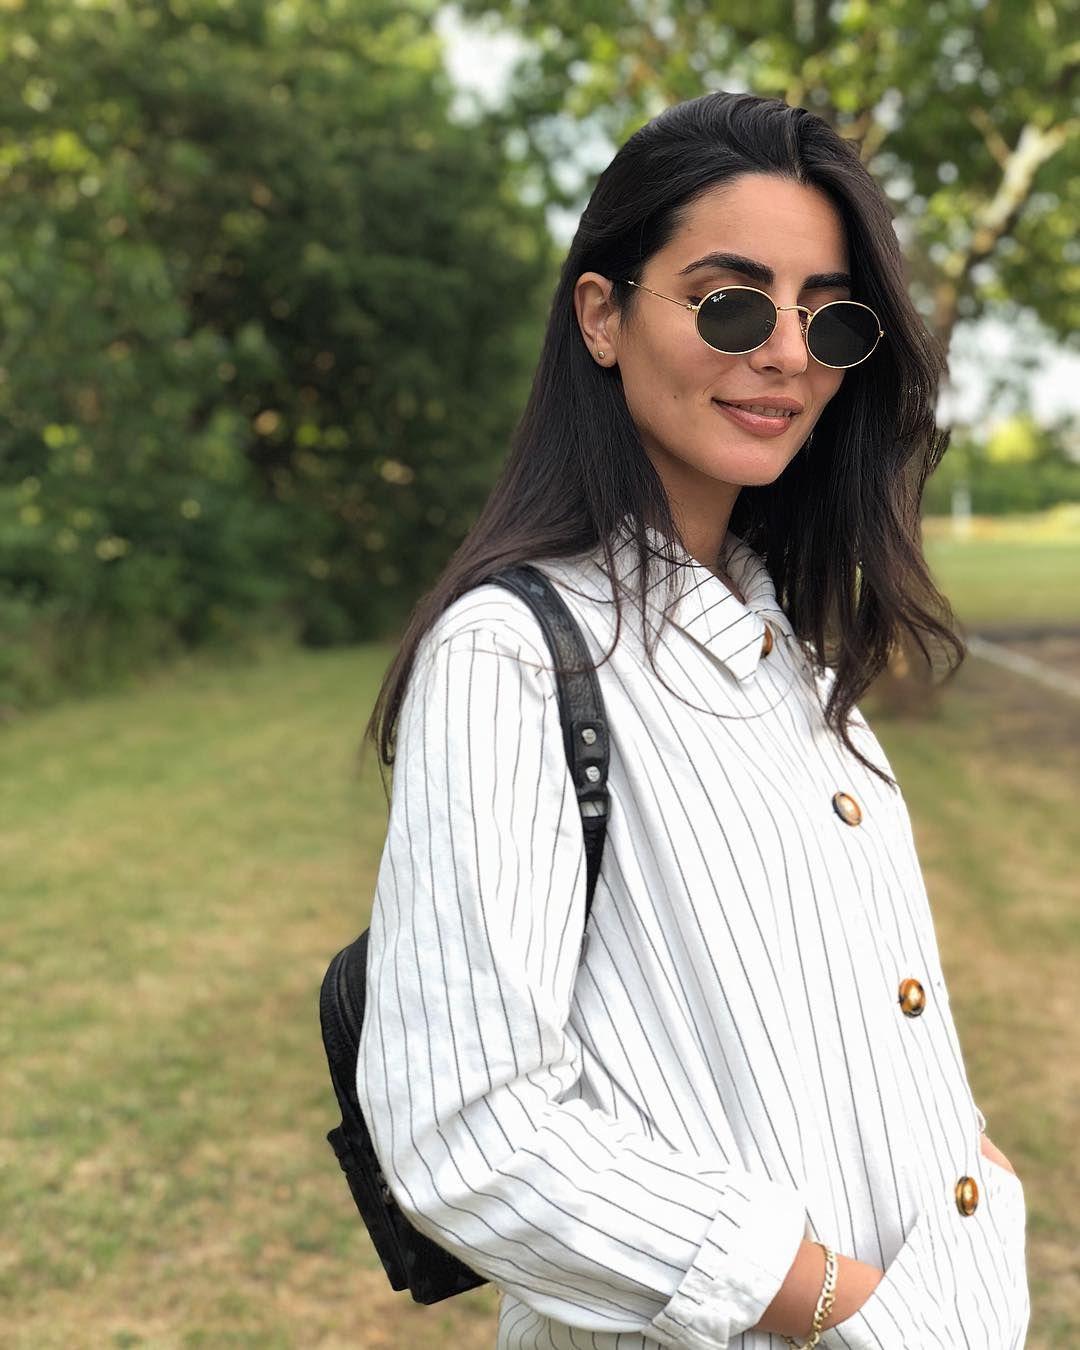 Instagram Bericht Van Basma Hamze بسمة حمزة 22 Jun 2018 Om 6 34 Utc Fashion Inspo Outfits Women